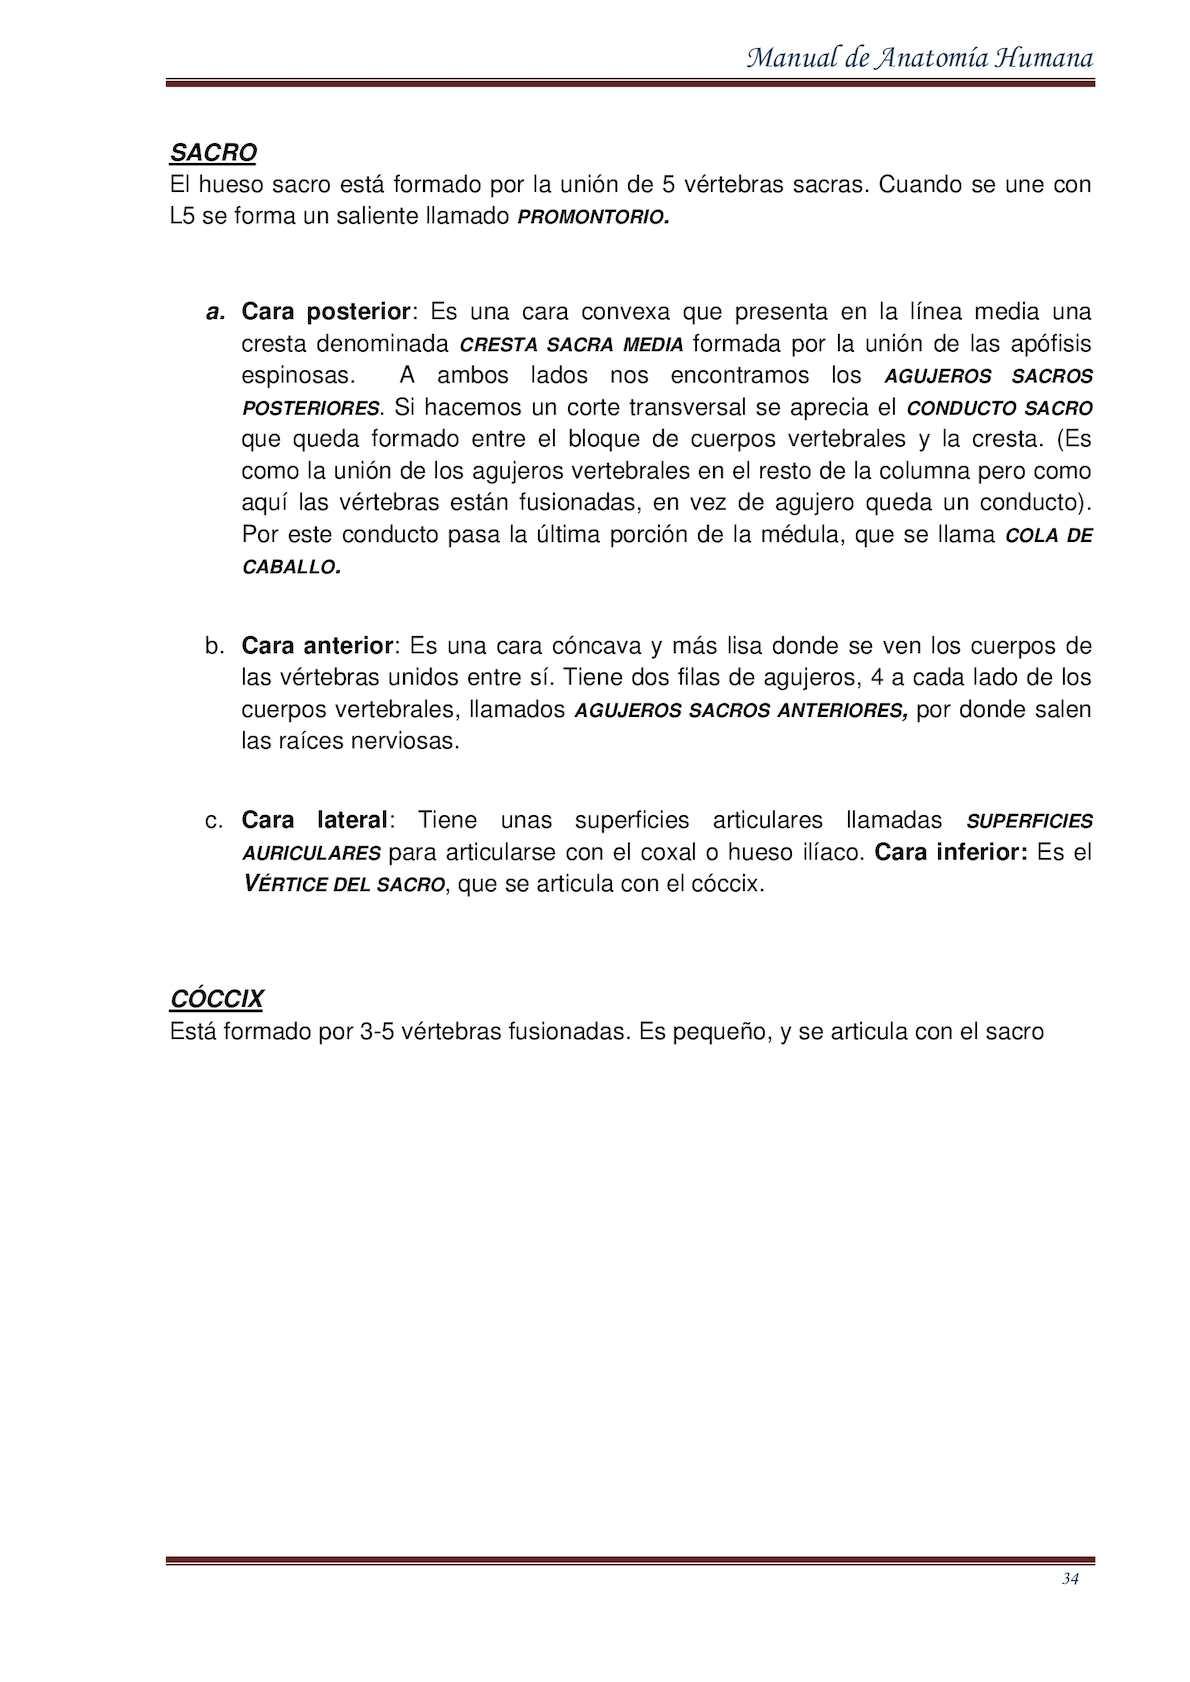 Manual De Anatomia Humana 2015 By Edwin Ambulodegui - CALAMEO Downloader